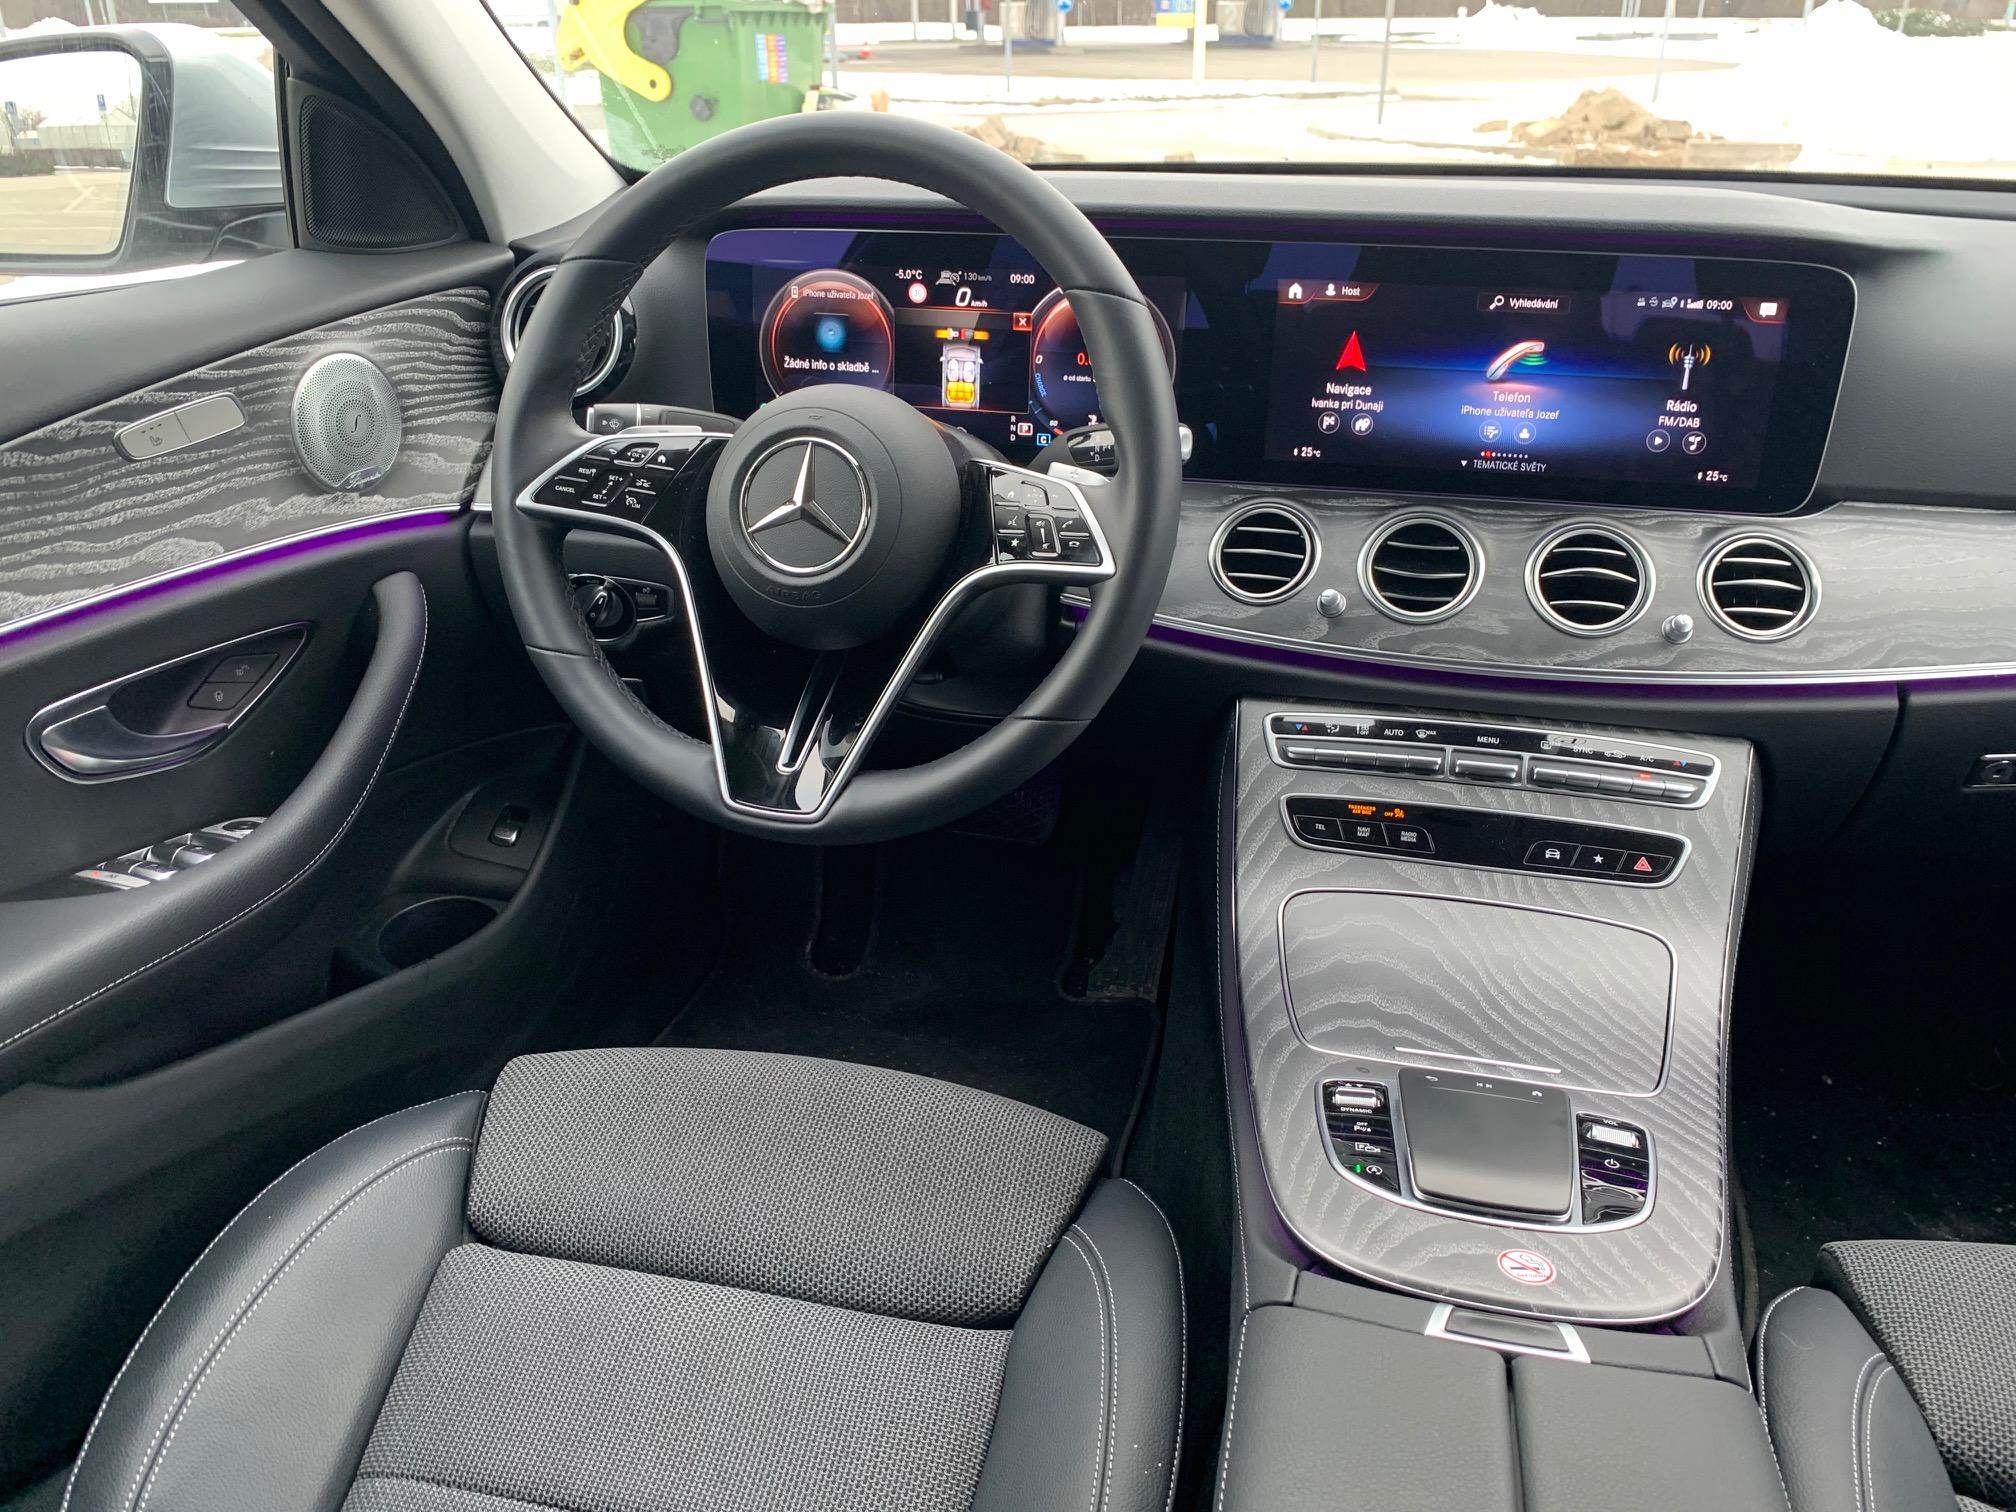 2021-Mercedes-Benz Trieda E 220d 4Matic (5)